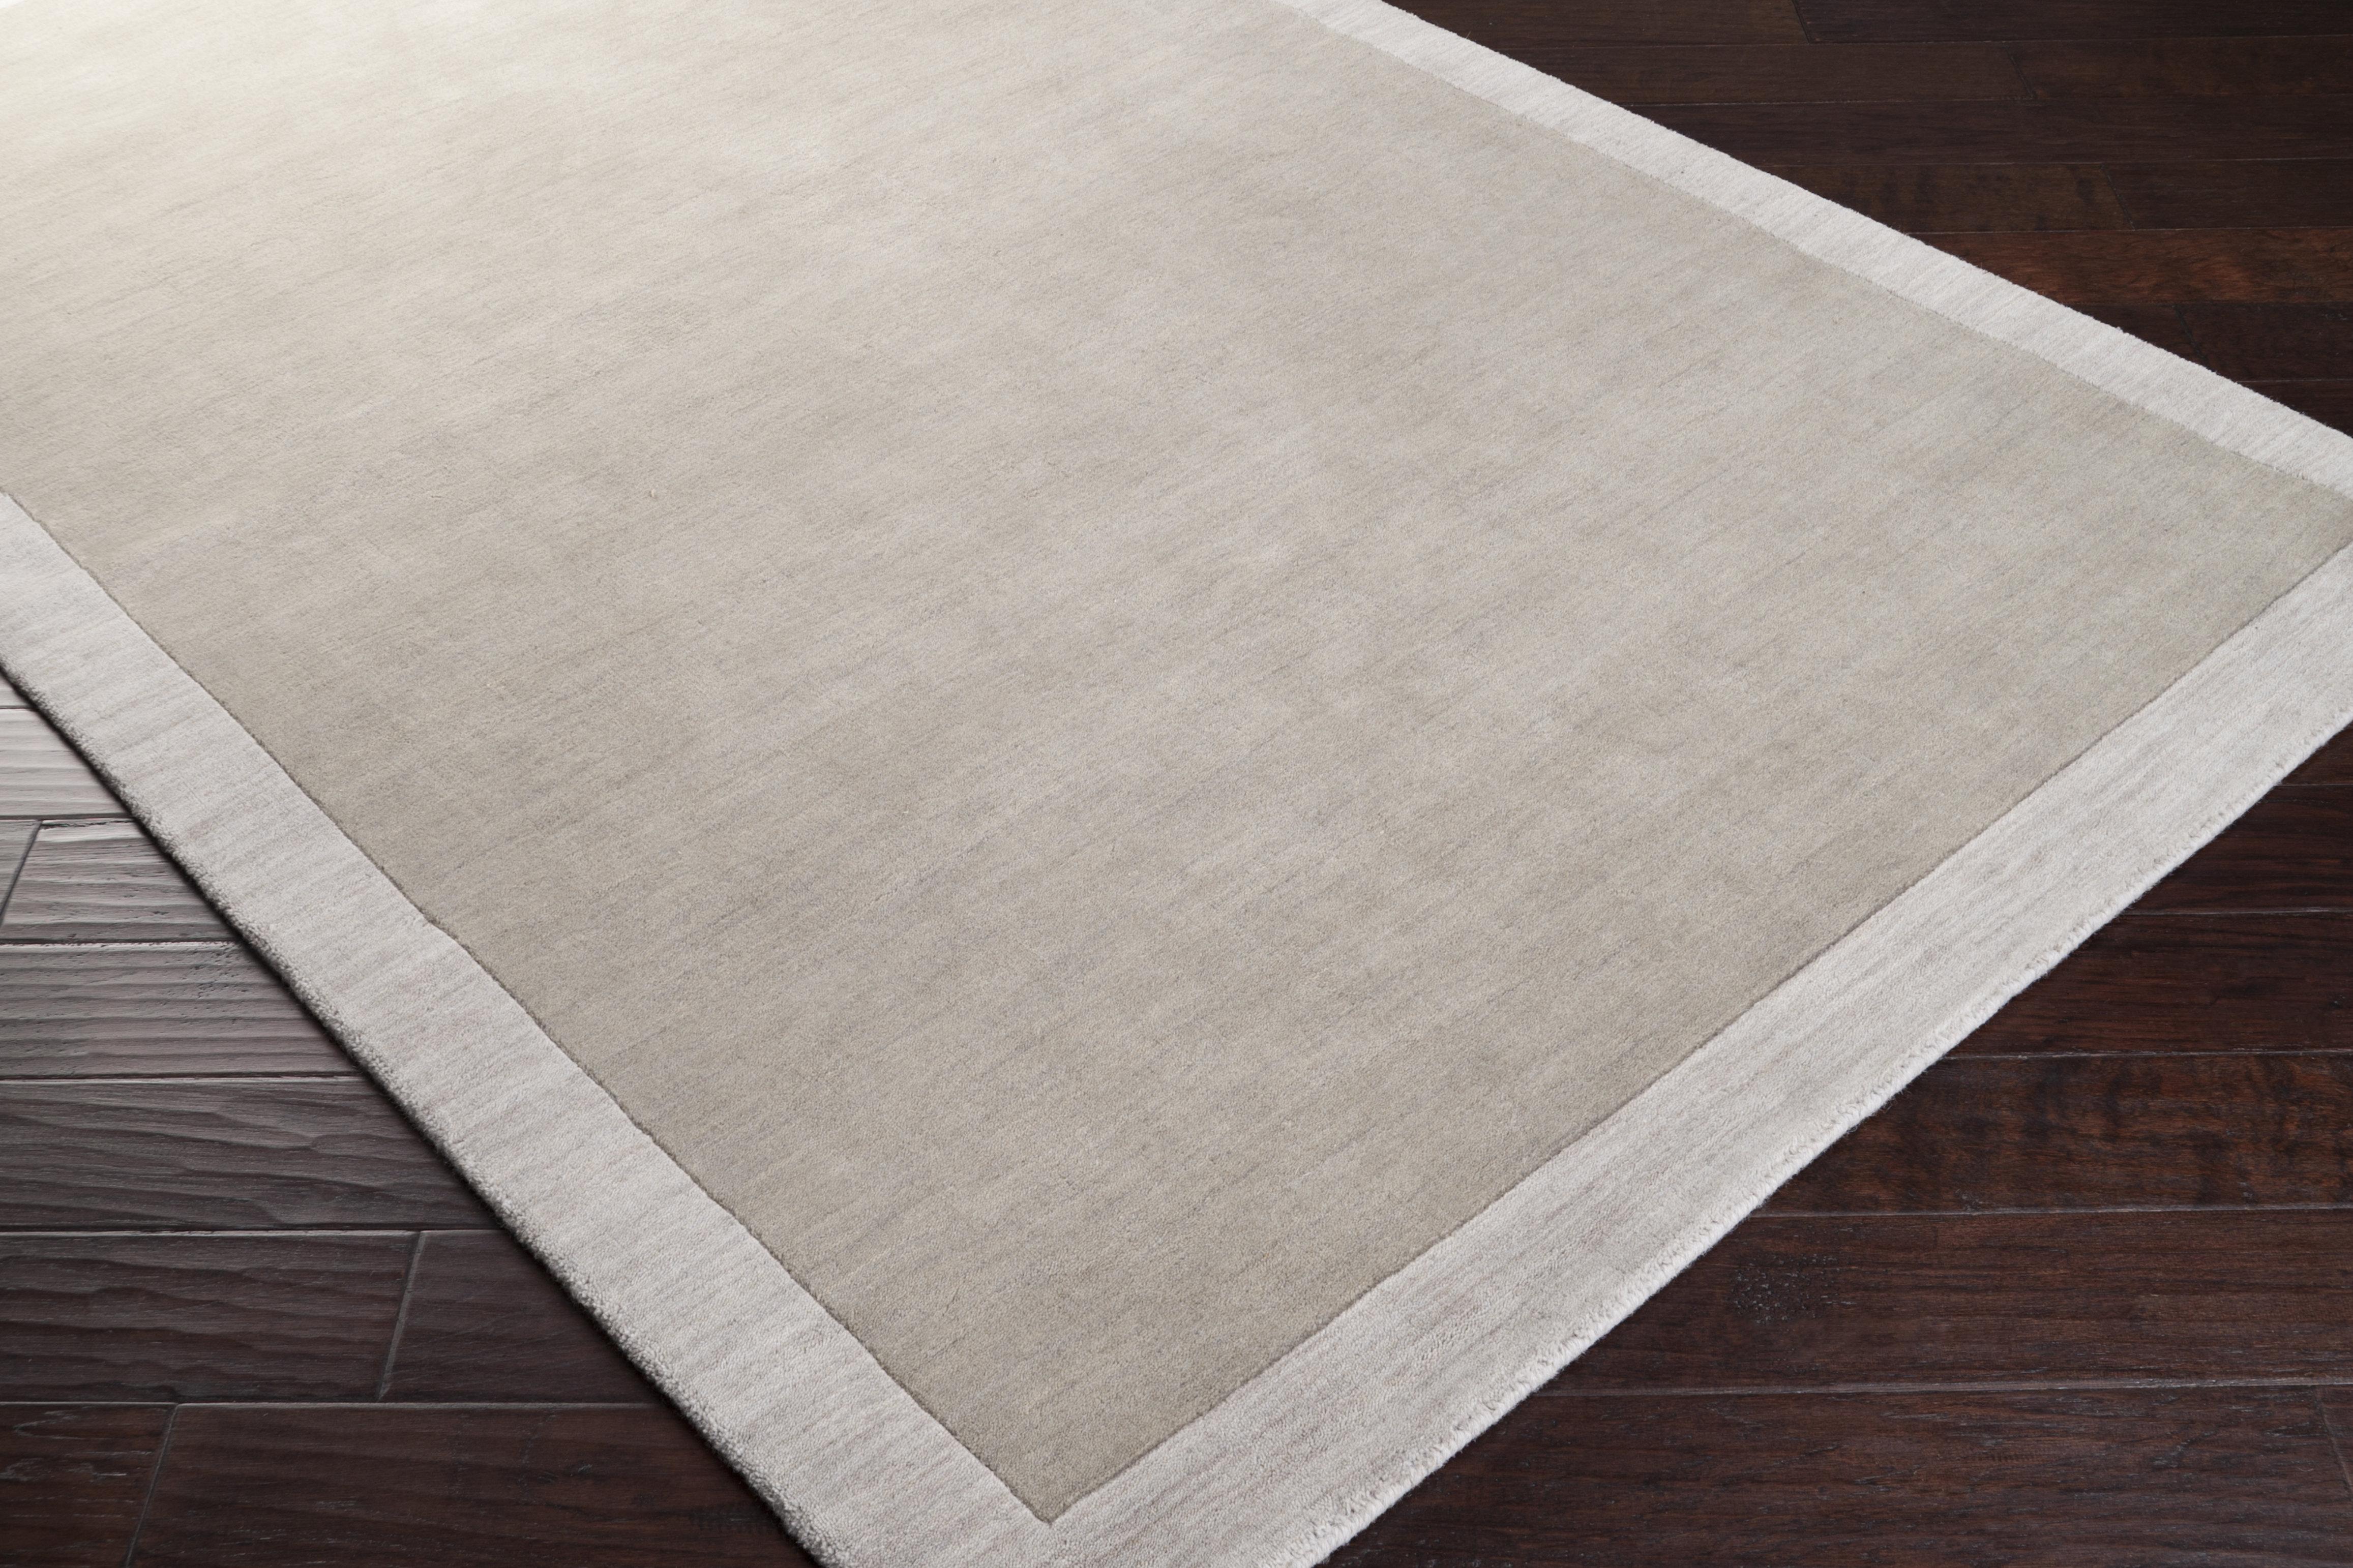 Angelo Home Madison Square Handmade Wool Light Gray Area Rug Reviews Wayfair